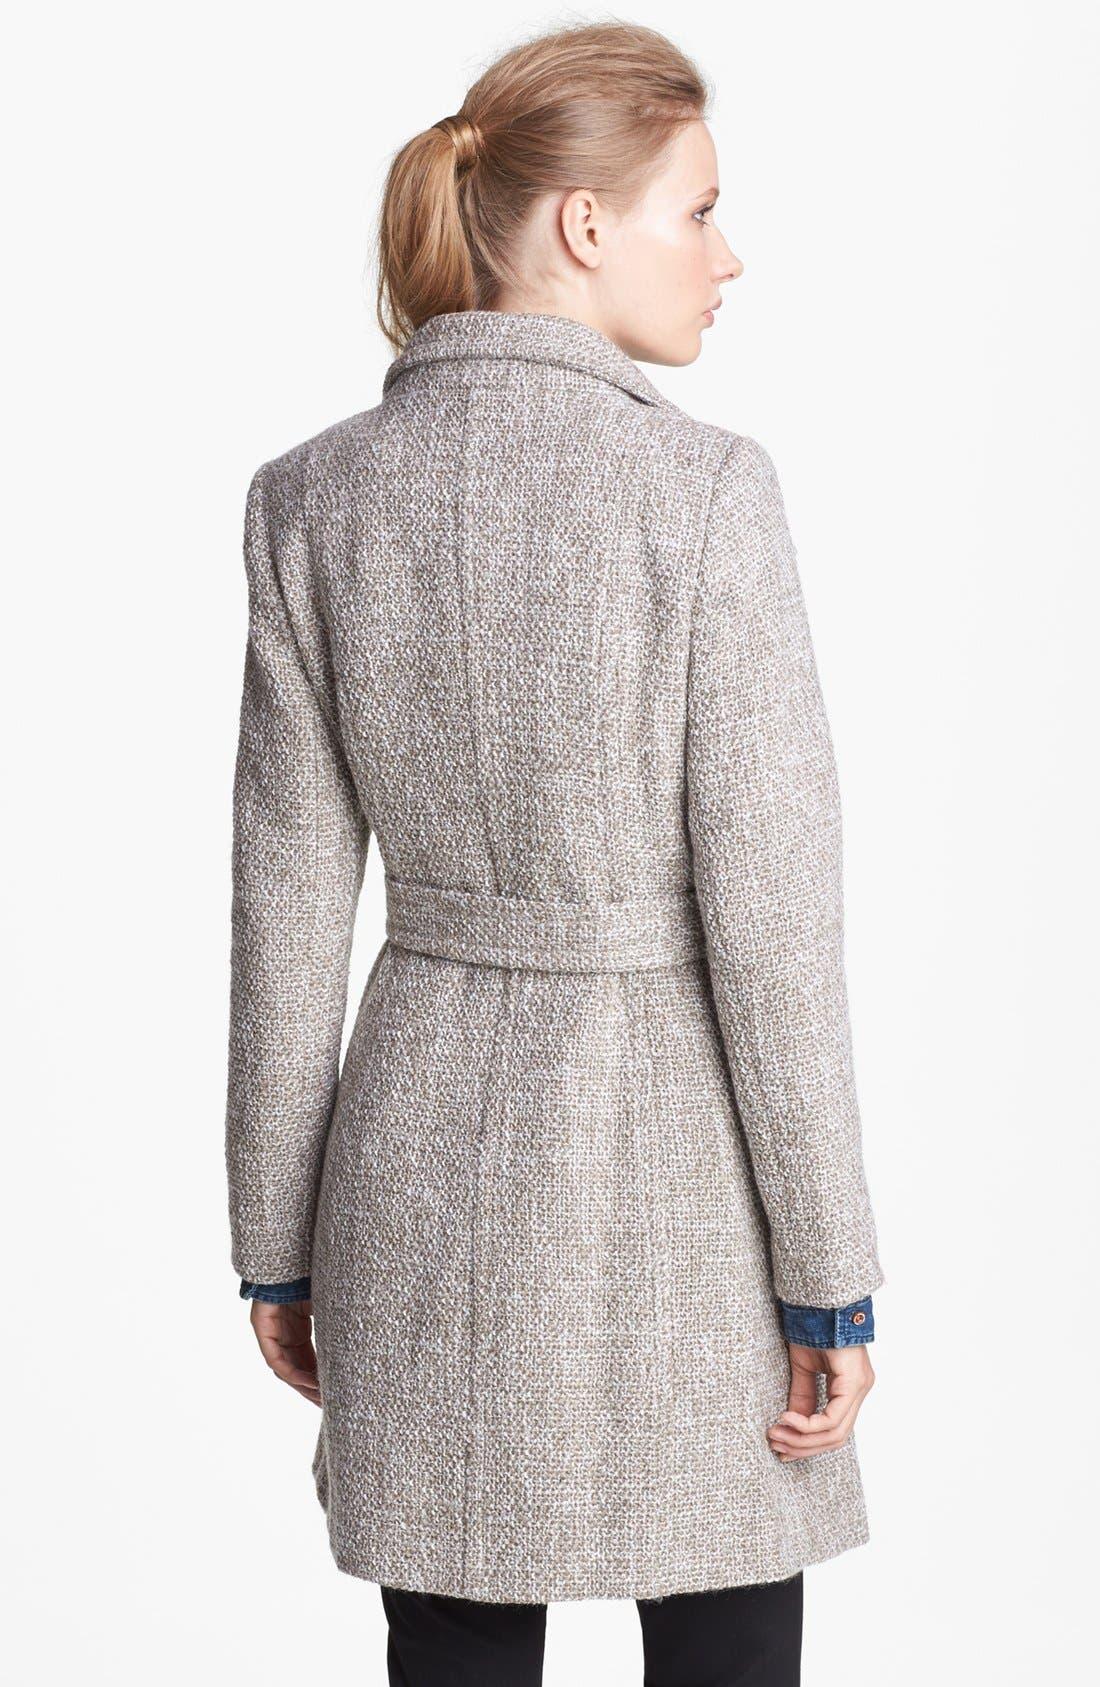 Alternate Image 2  - T Tahari 'Izzy' Belted Tweed Coat (Online Only)